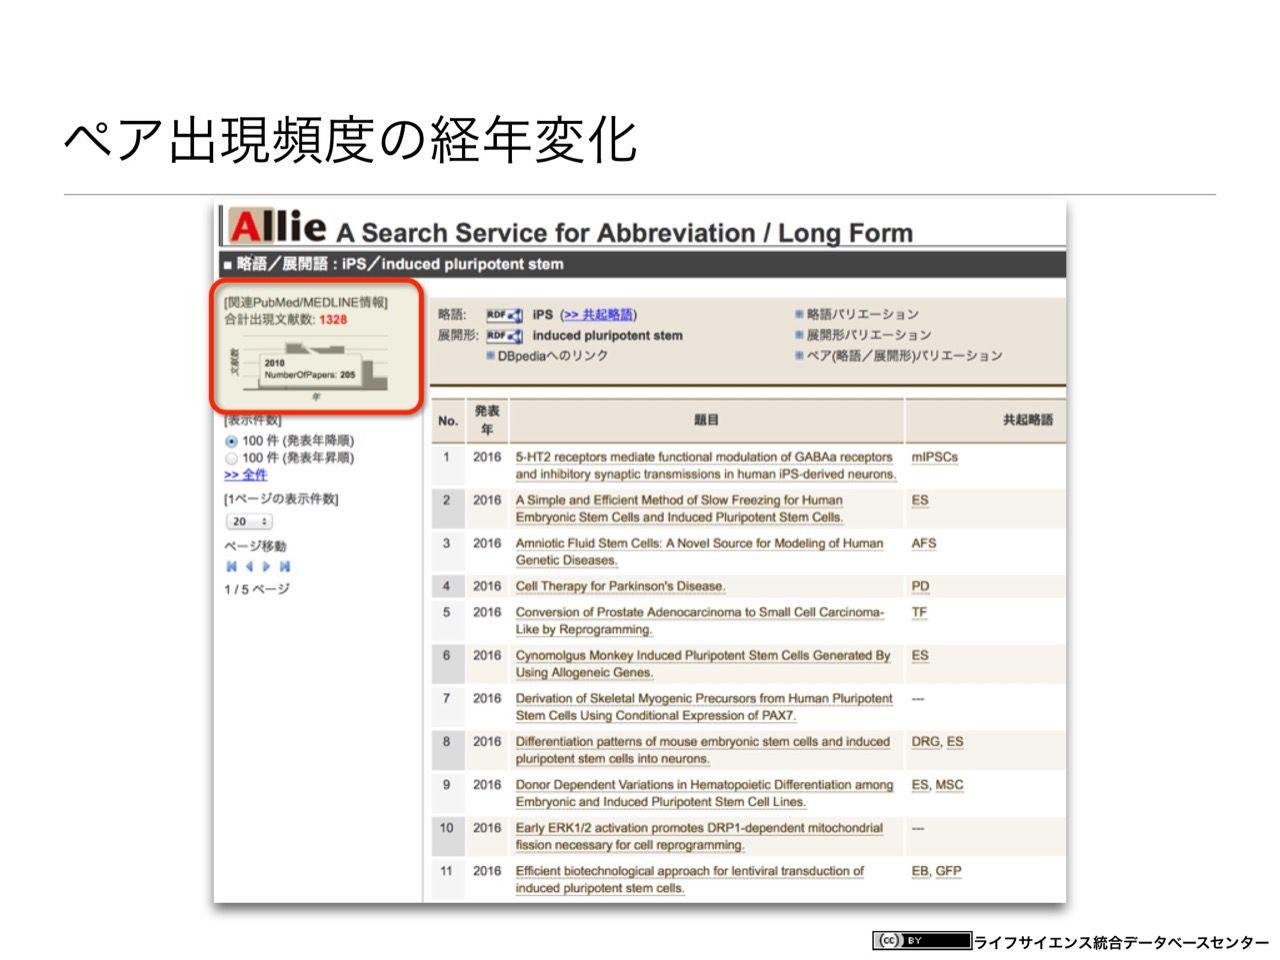 images/AJACS60_yamamoto_041.jpg